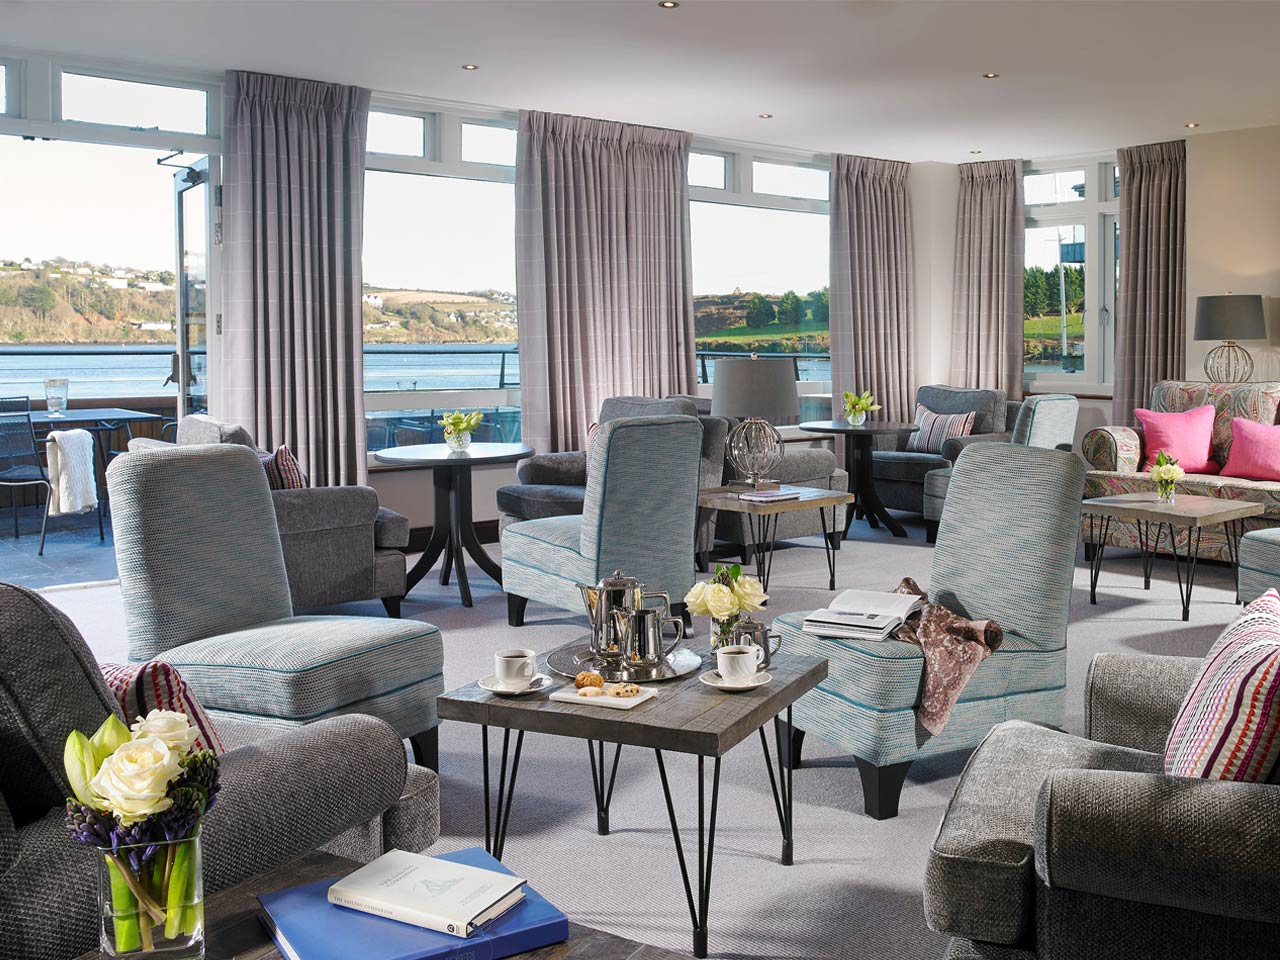 Trident Hotel Kinsale | Personal Driver Ireland